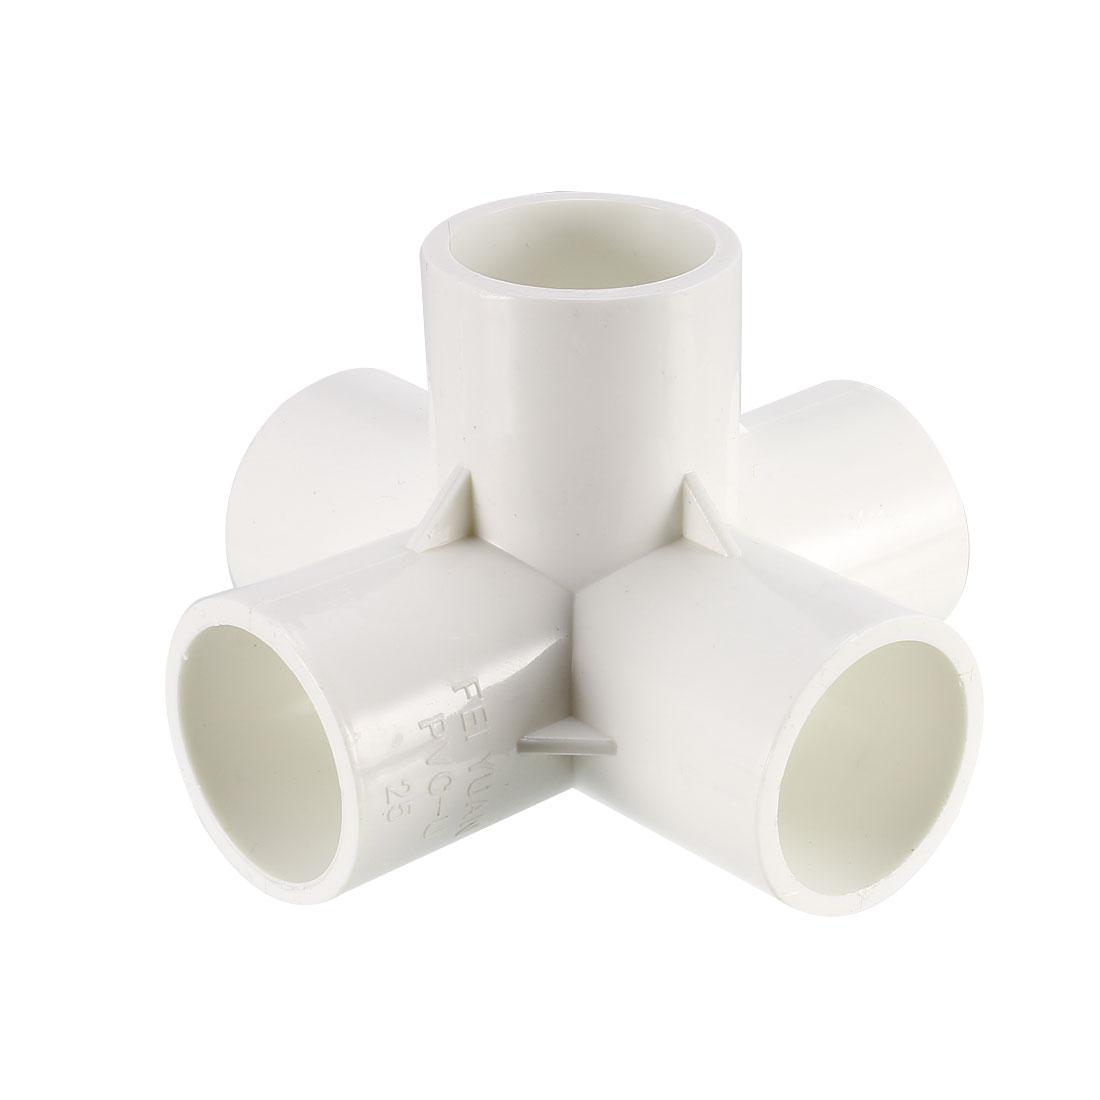 5 Way 25mm Tee PVC Fitting Elbow - PVC Furniture - PVC Elbow Fittings 2Pcs